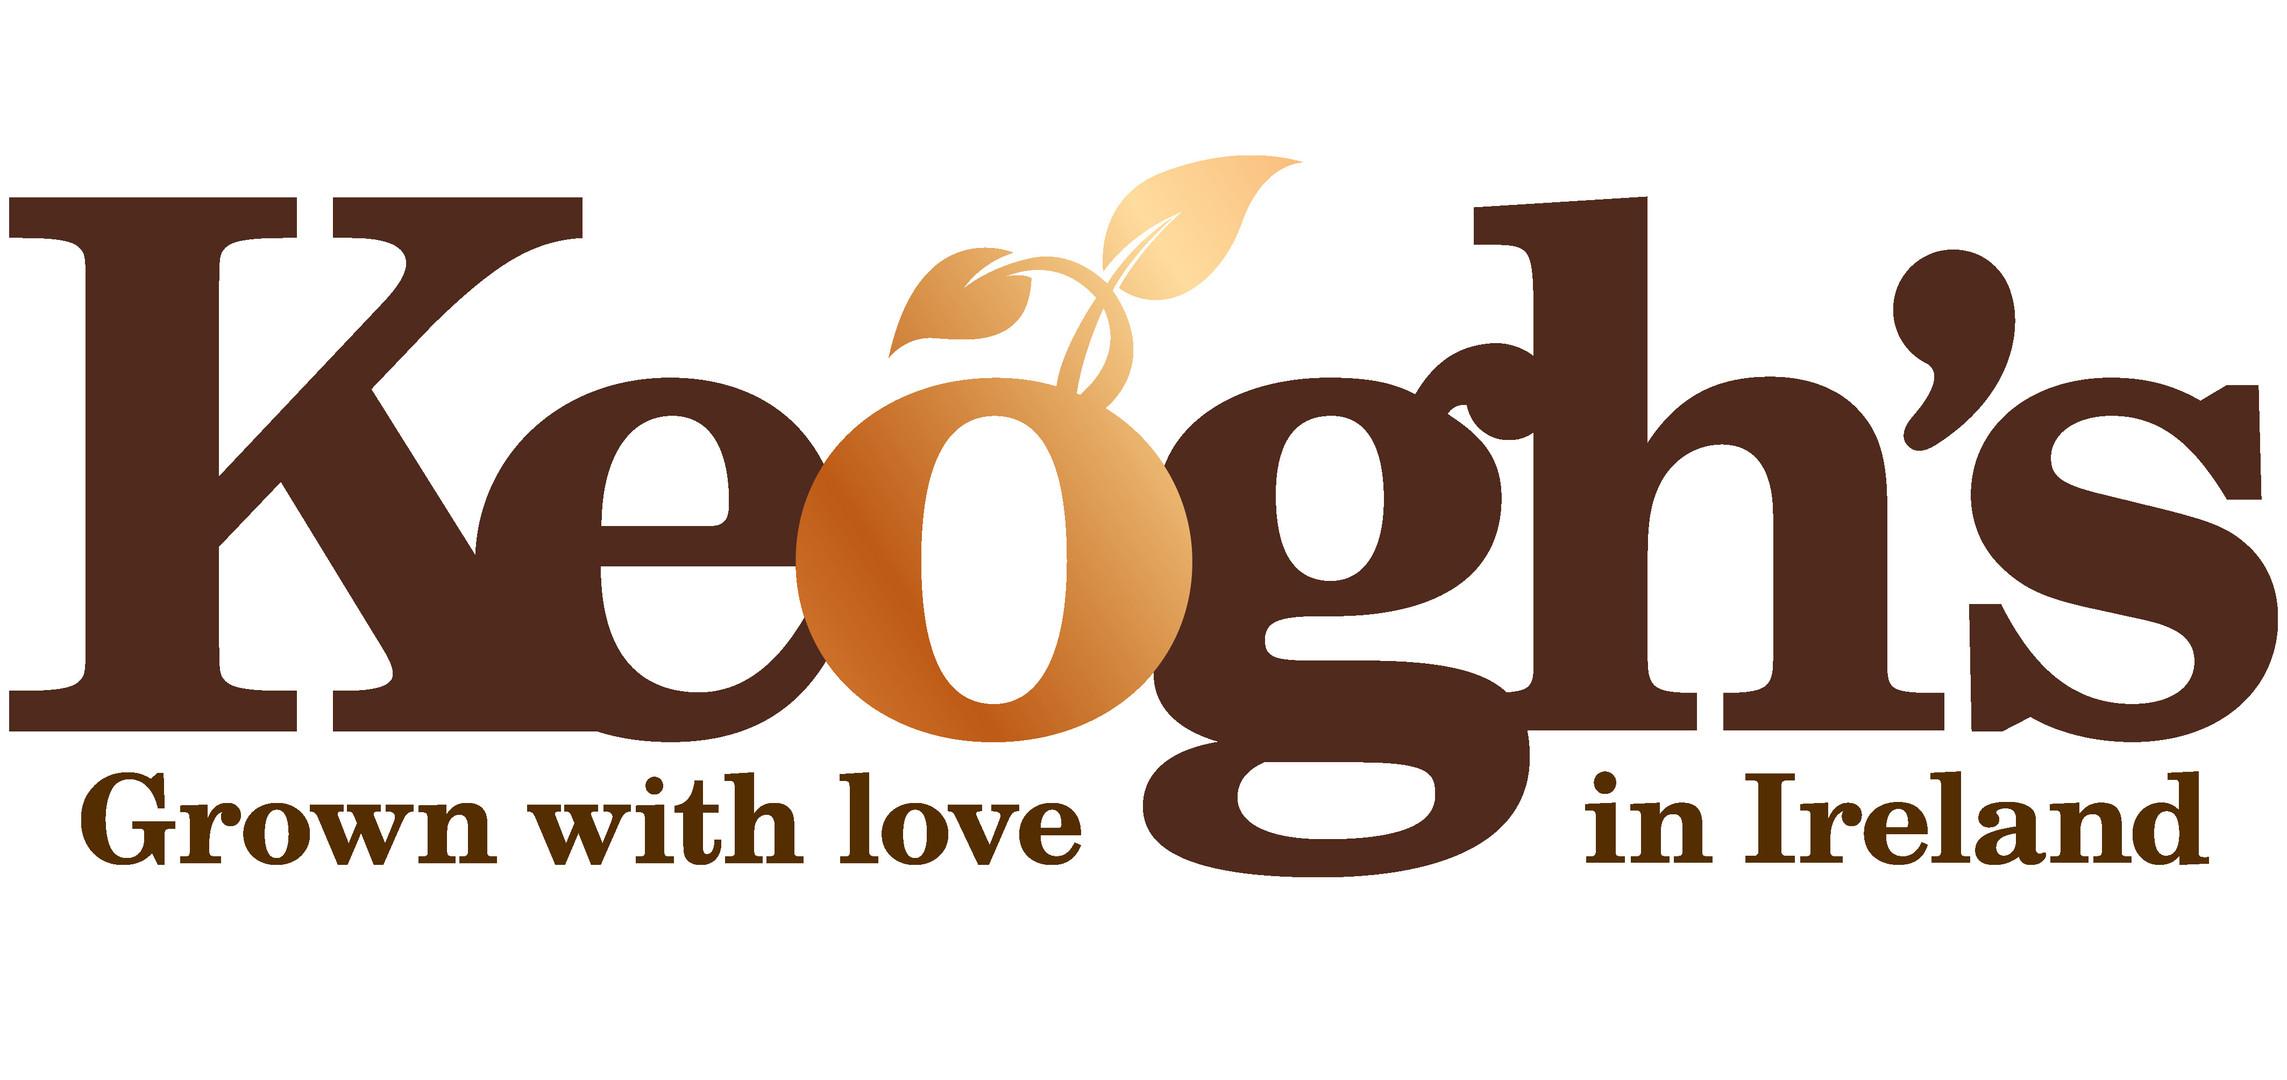 Keogh's.jpg